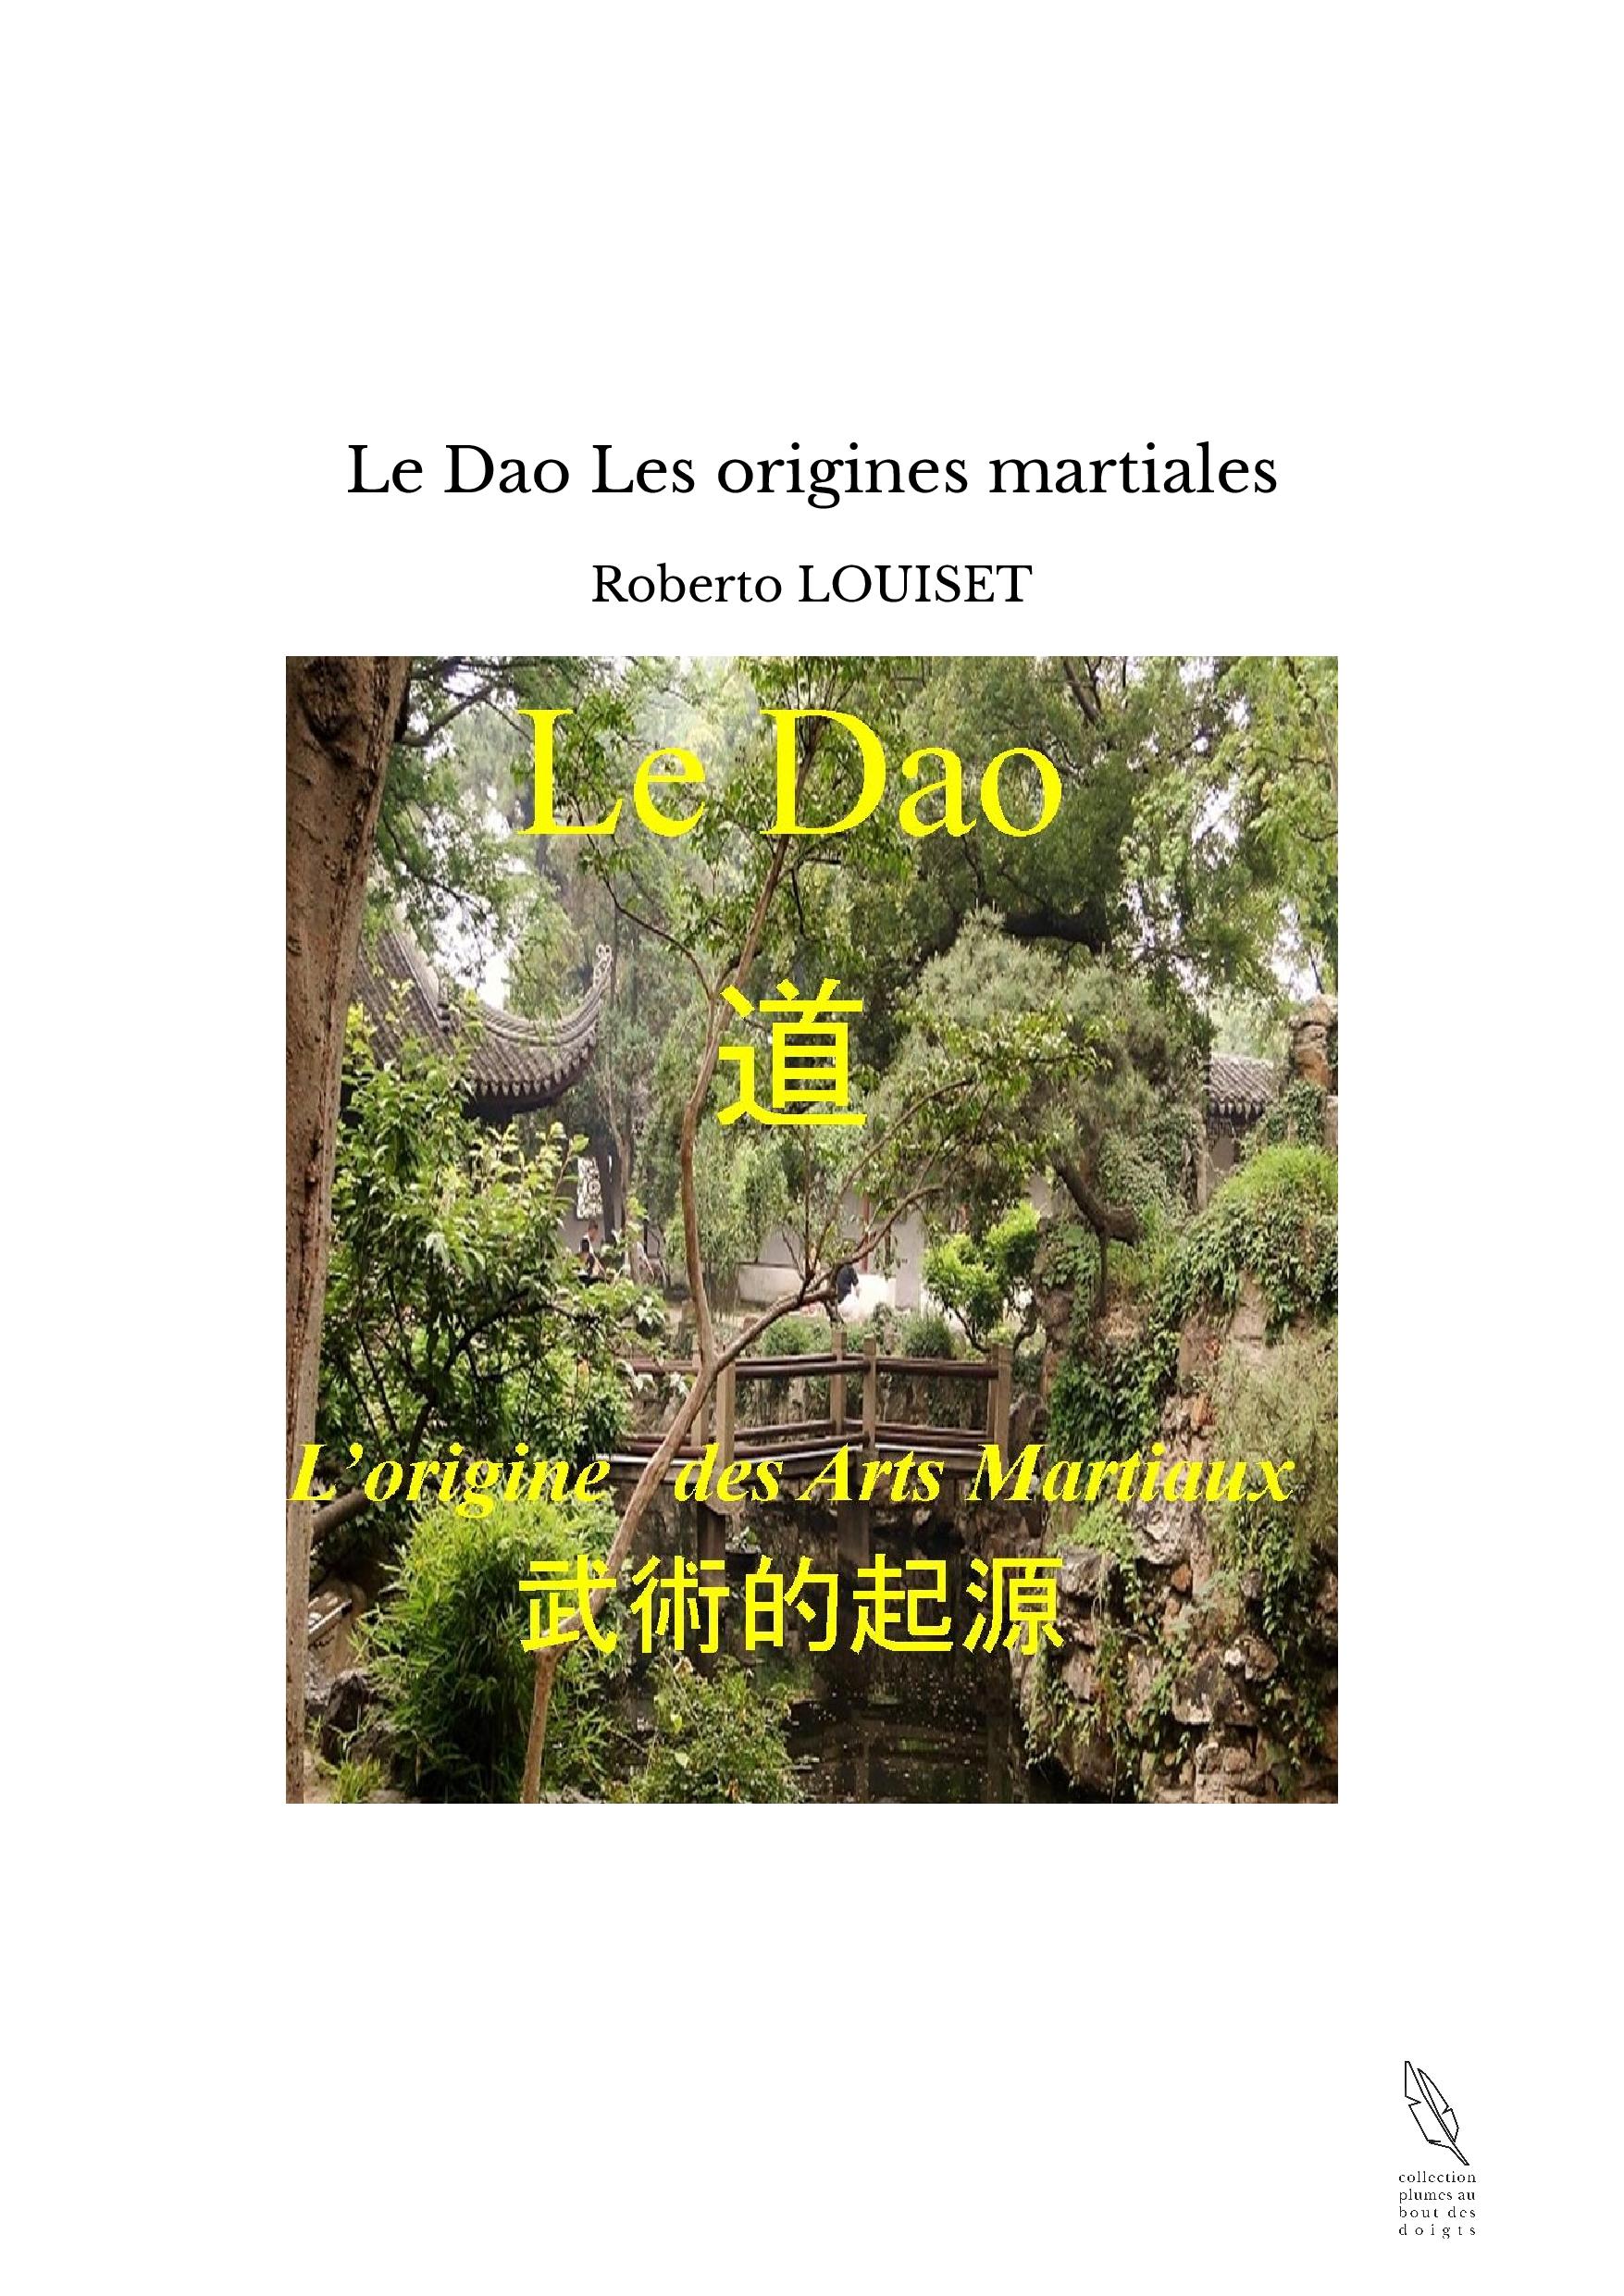 Le Dao Les origines martiales